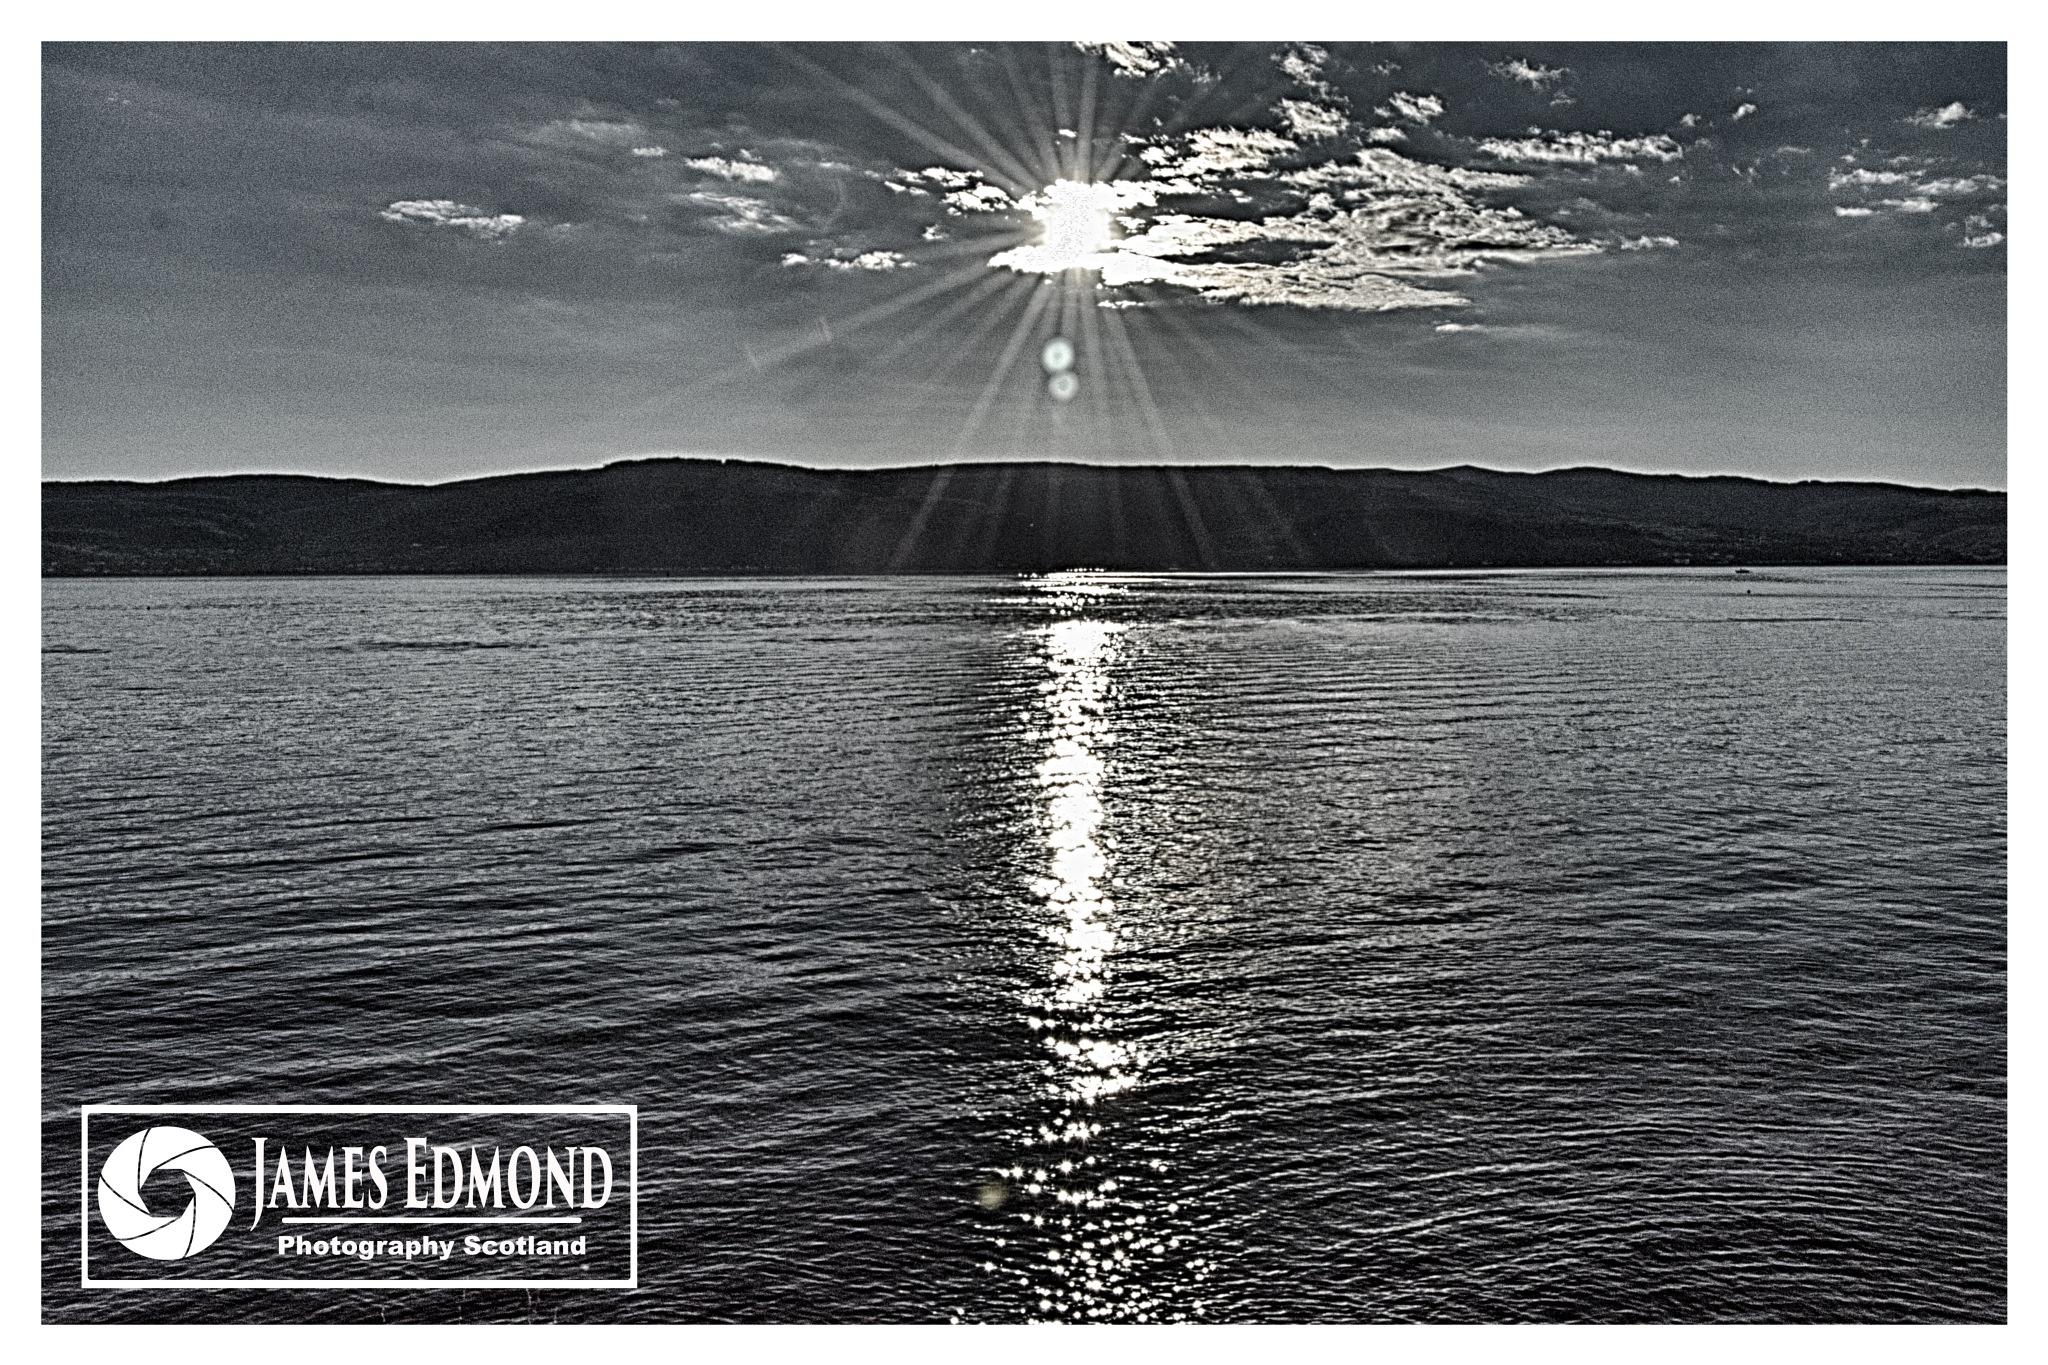 Sunset at Inverkip by James Edmond Photography